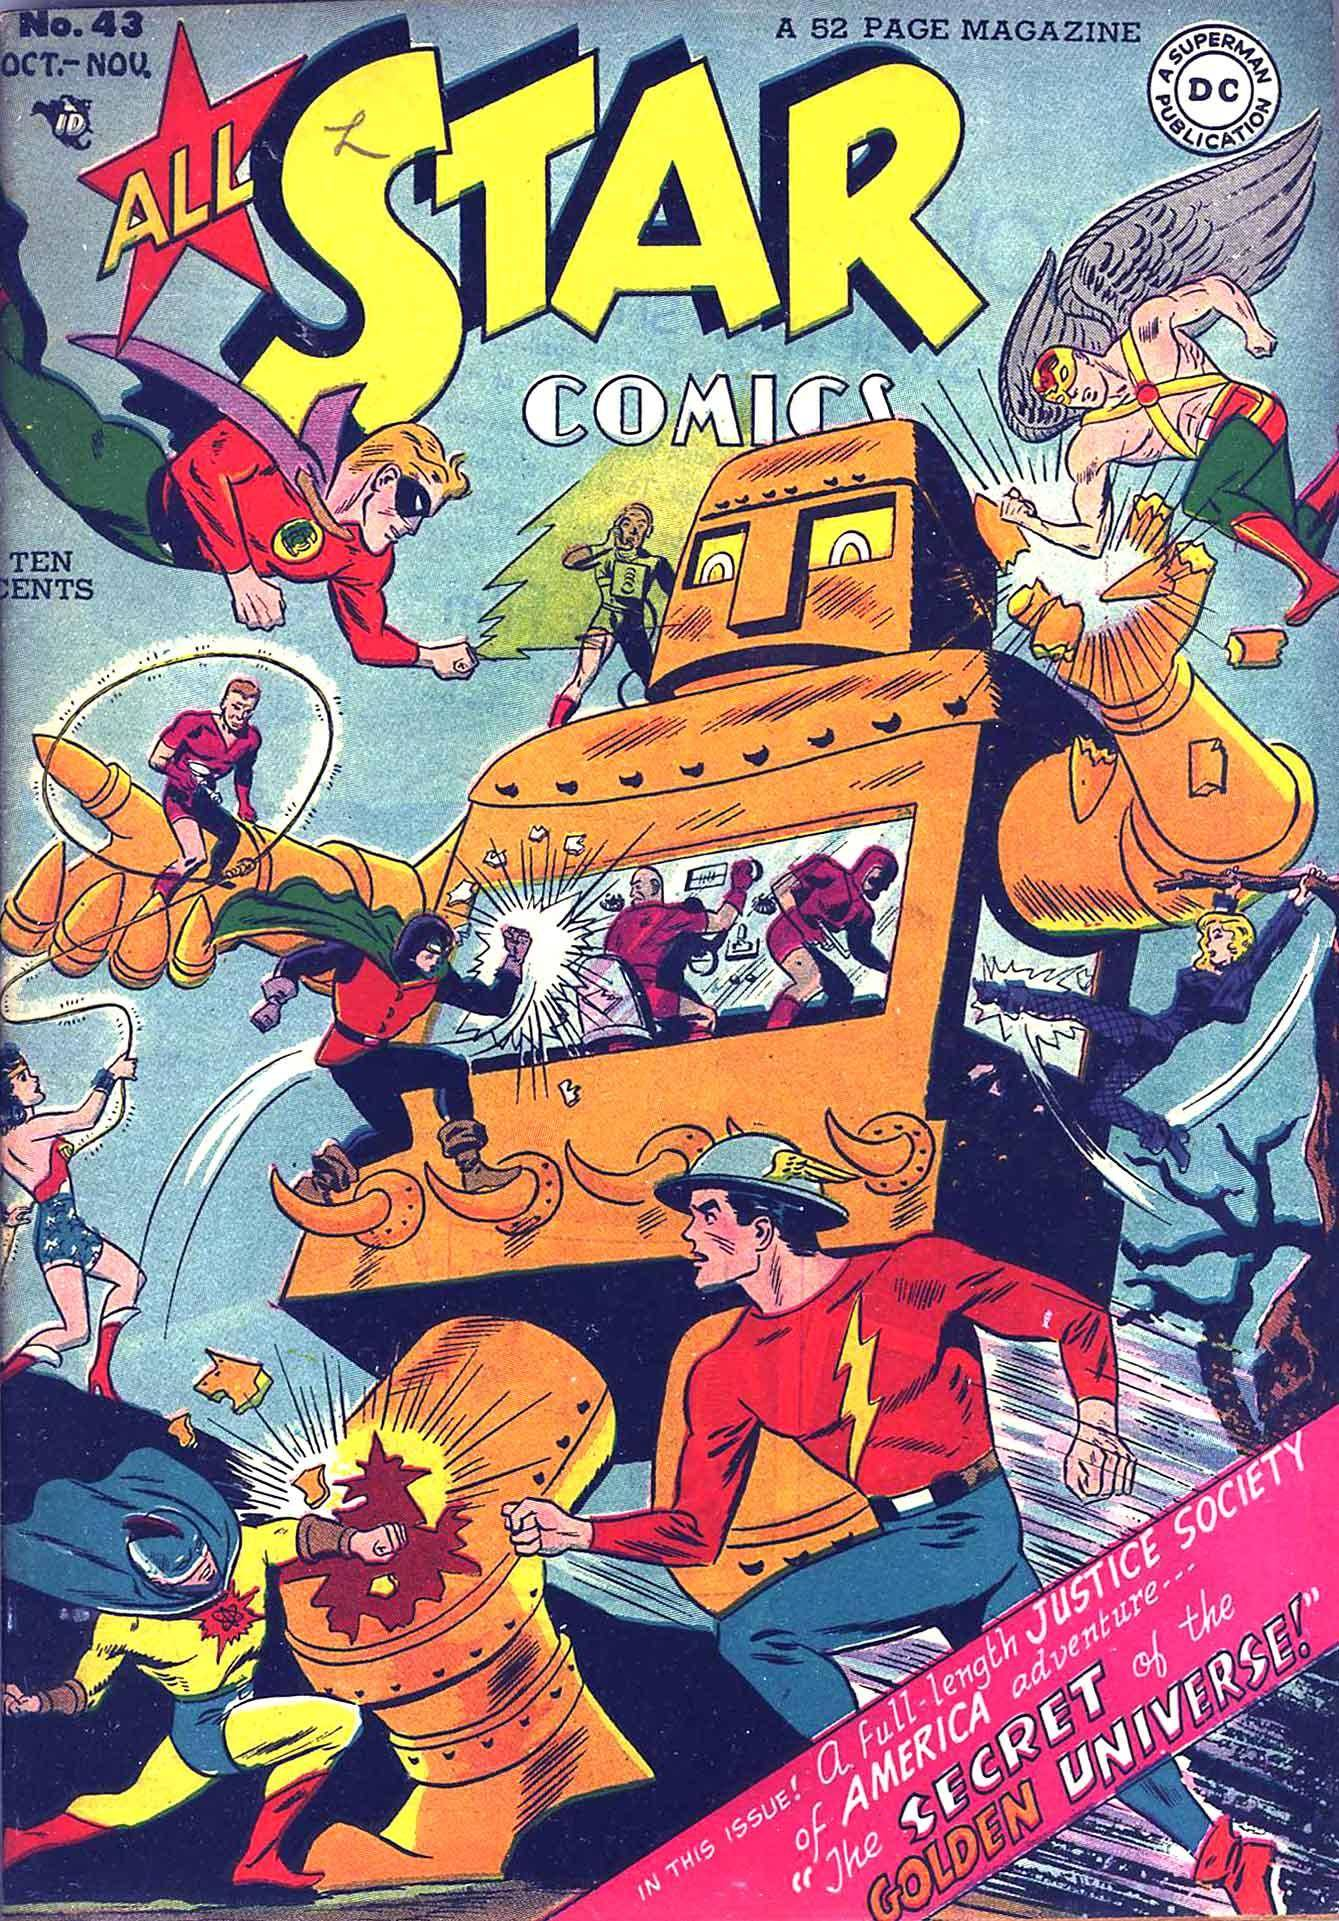 All-Star Comics 043 1948